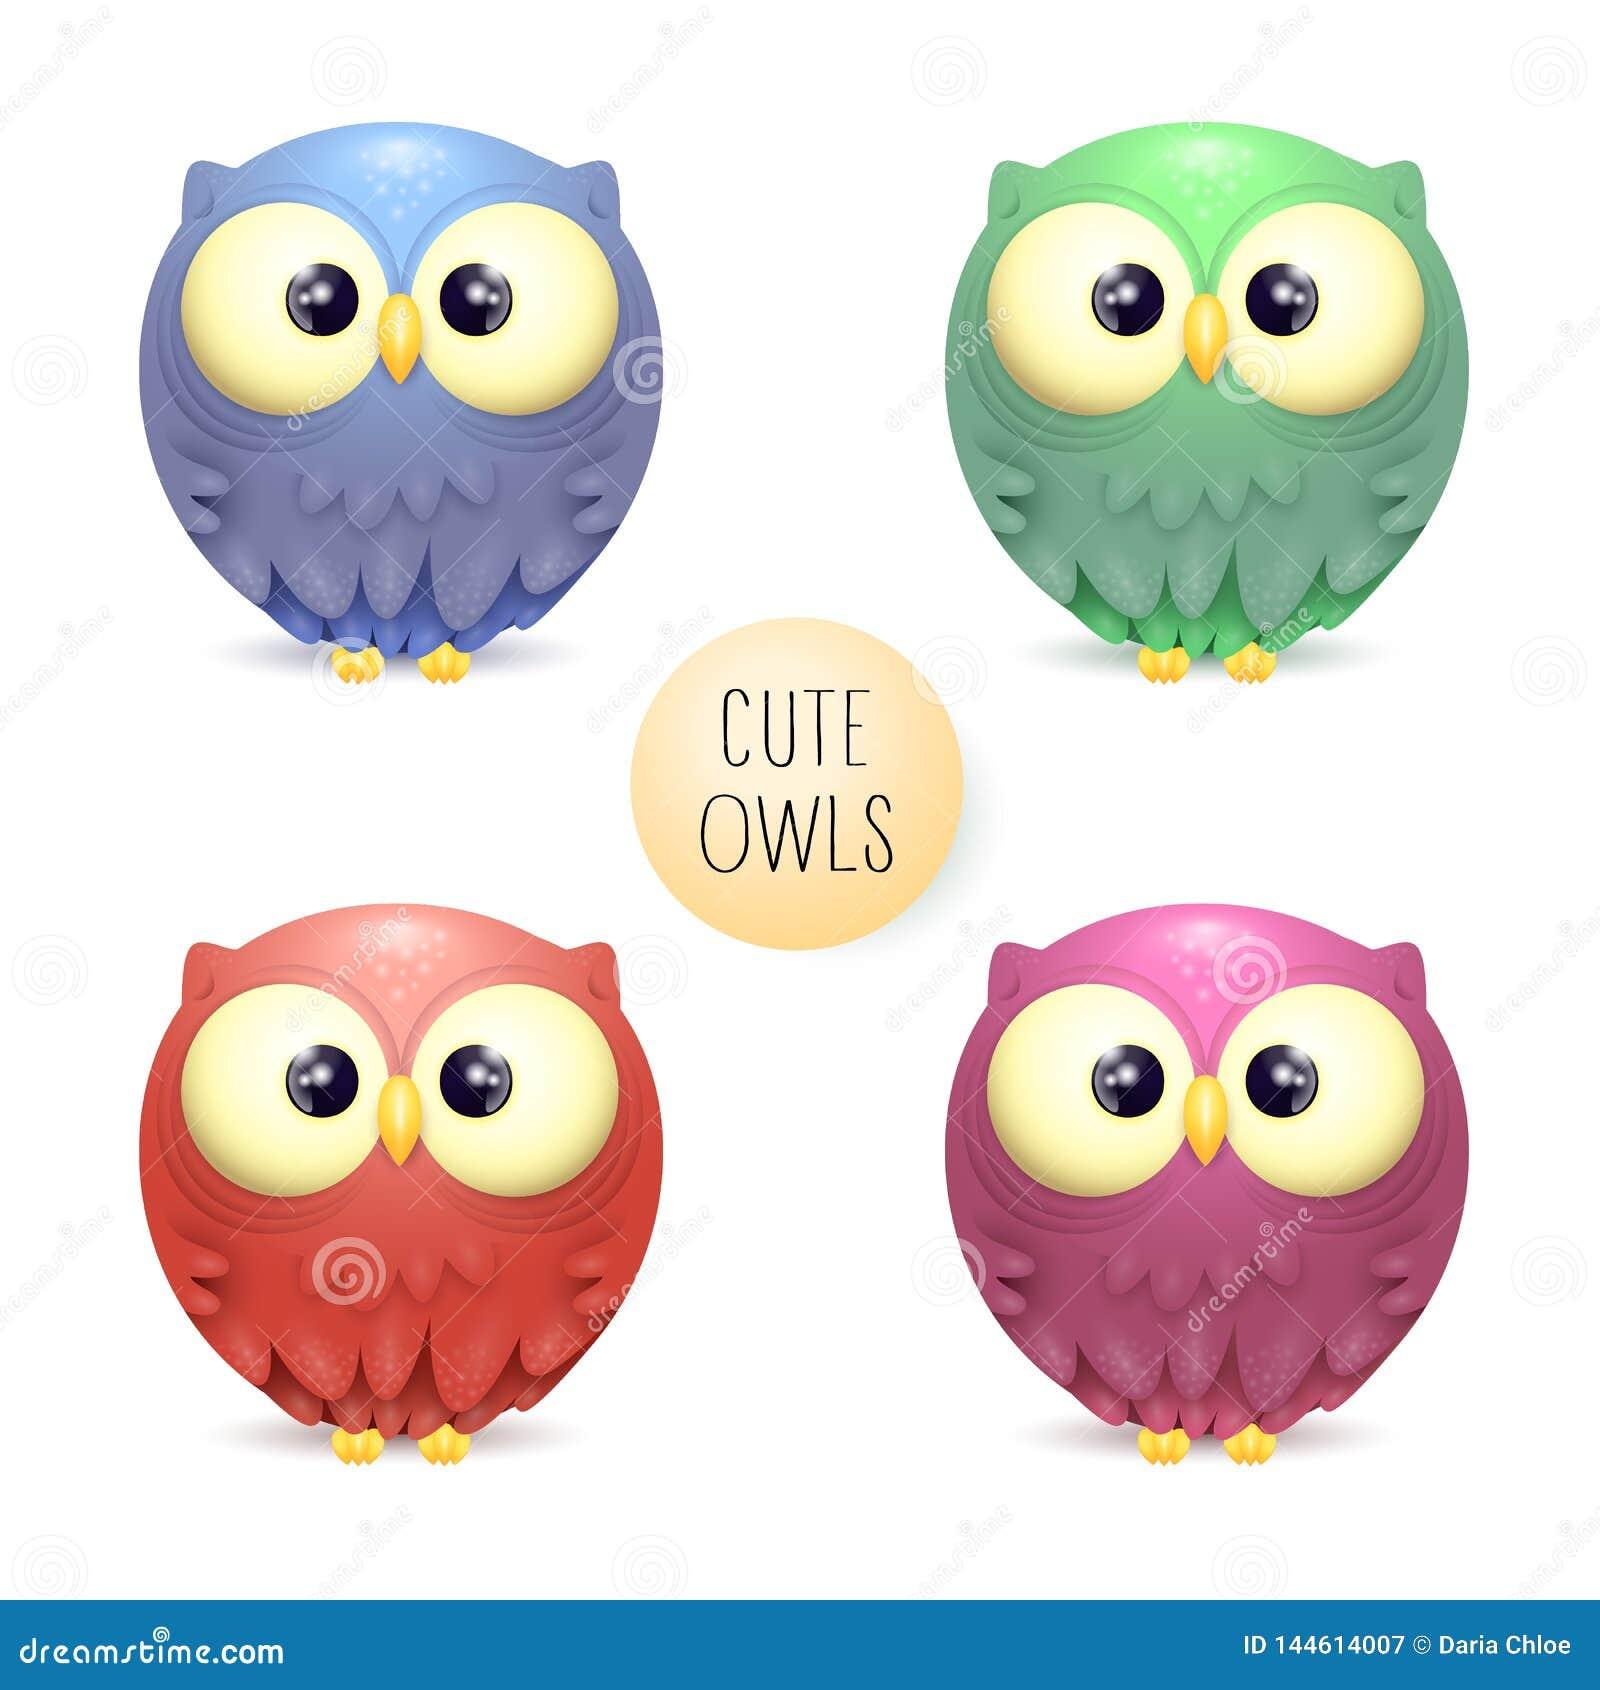 Cute vector collection of bright multicolor owls